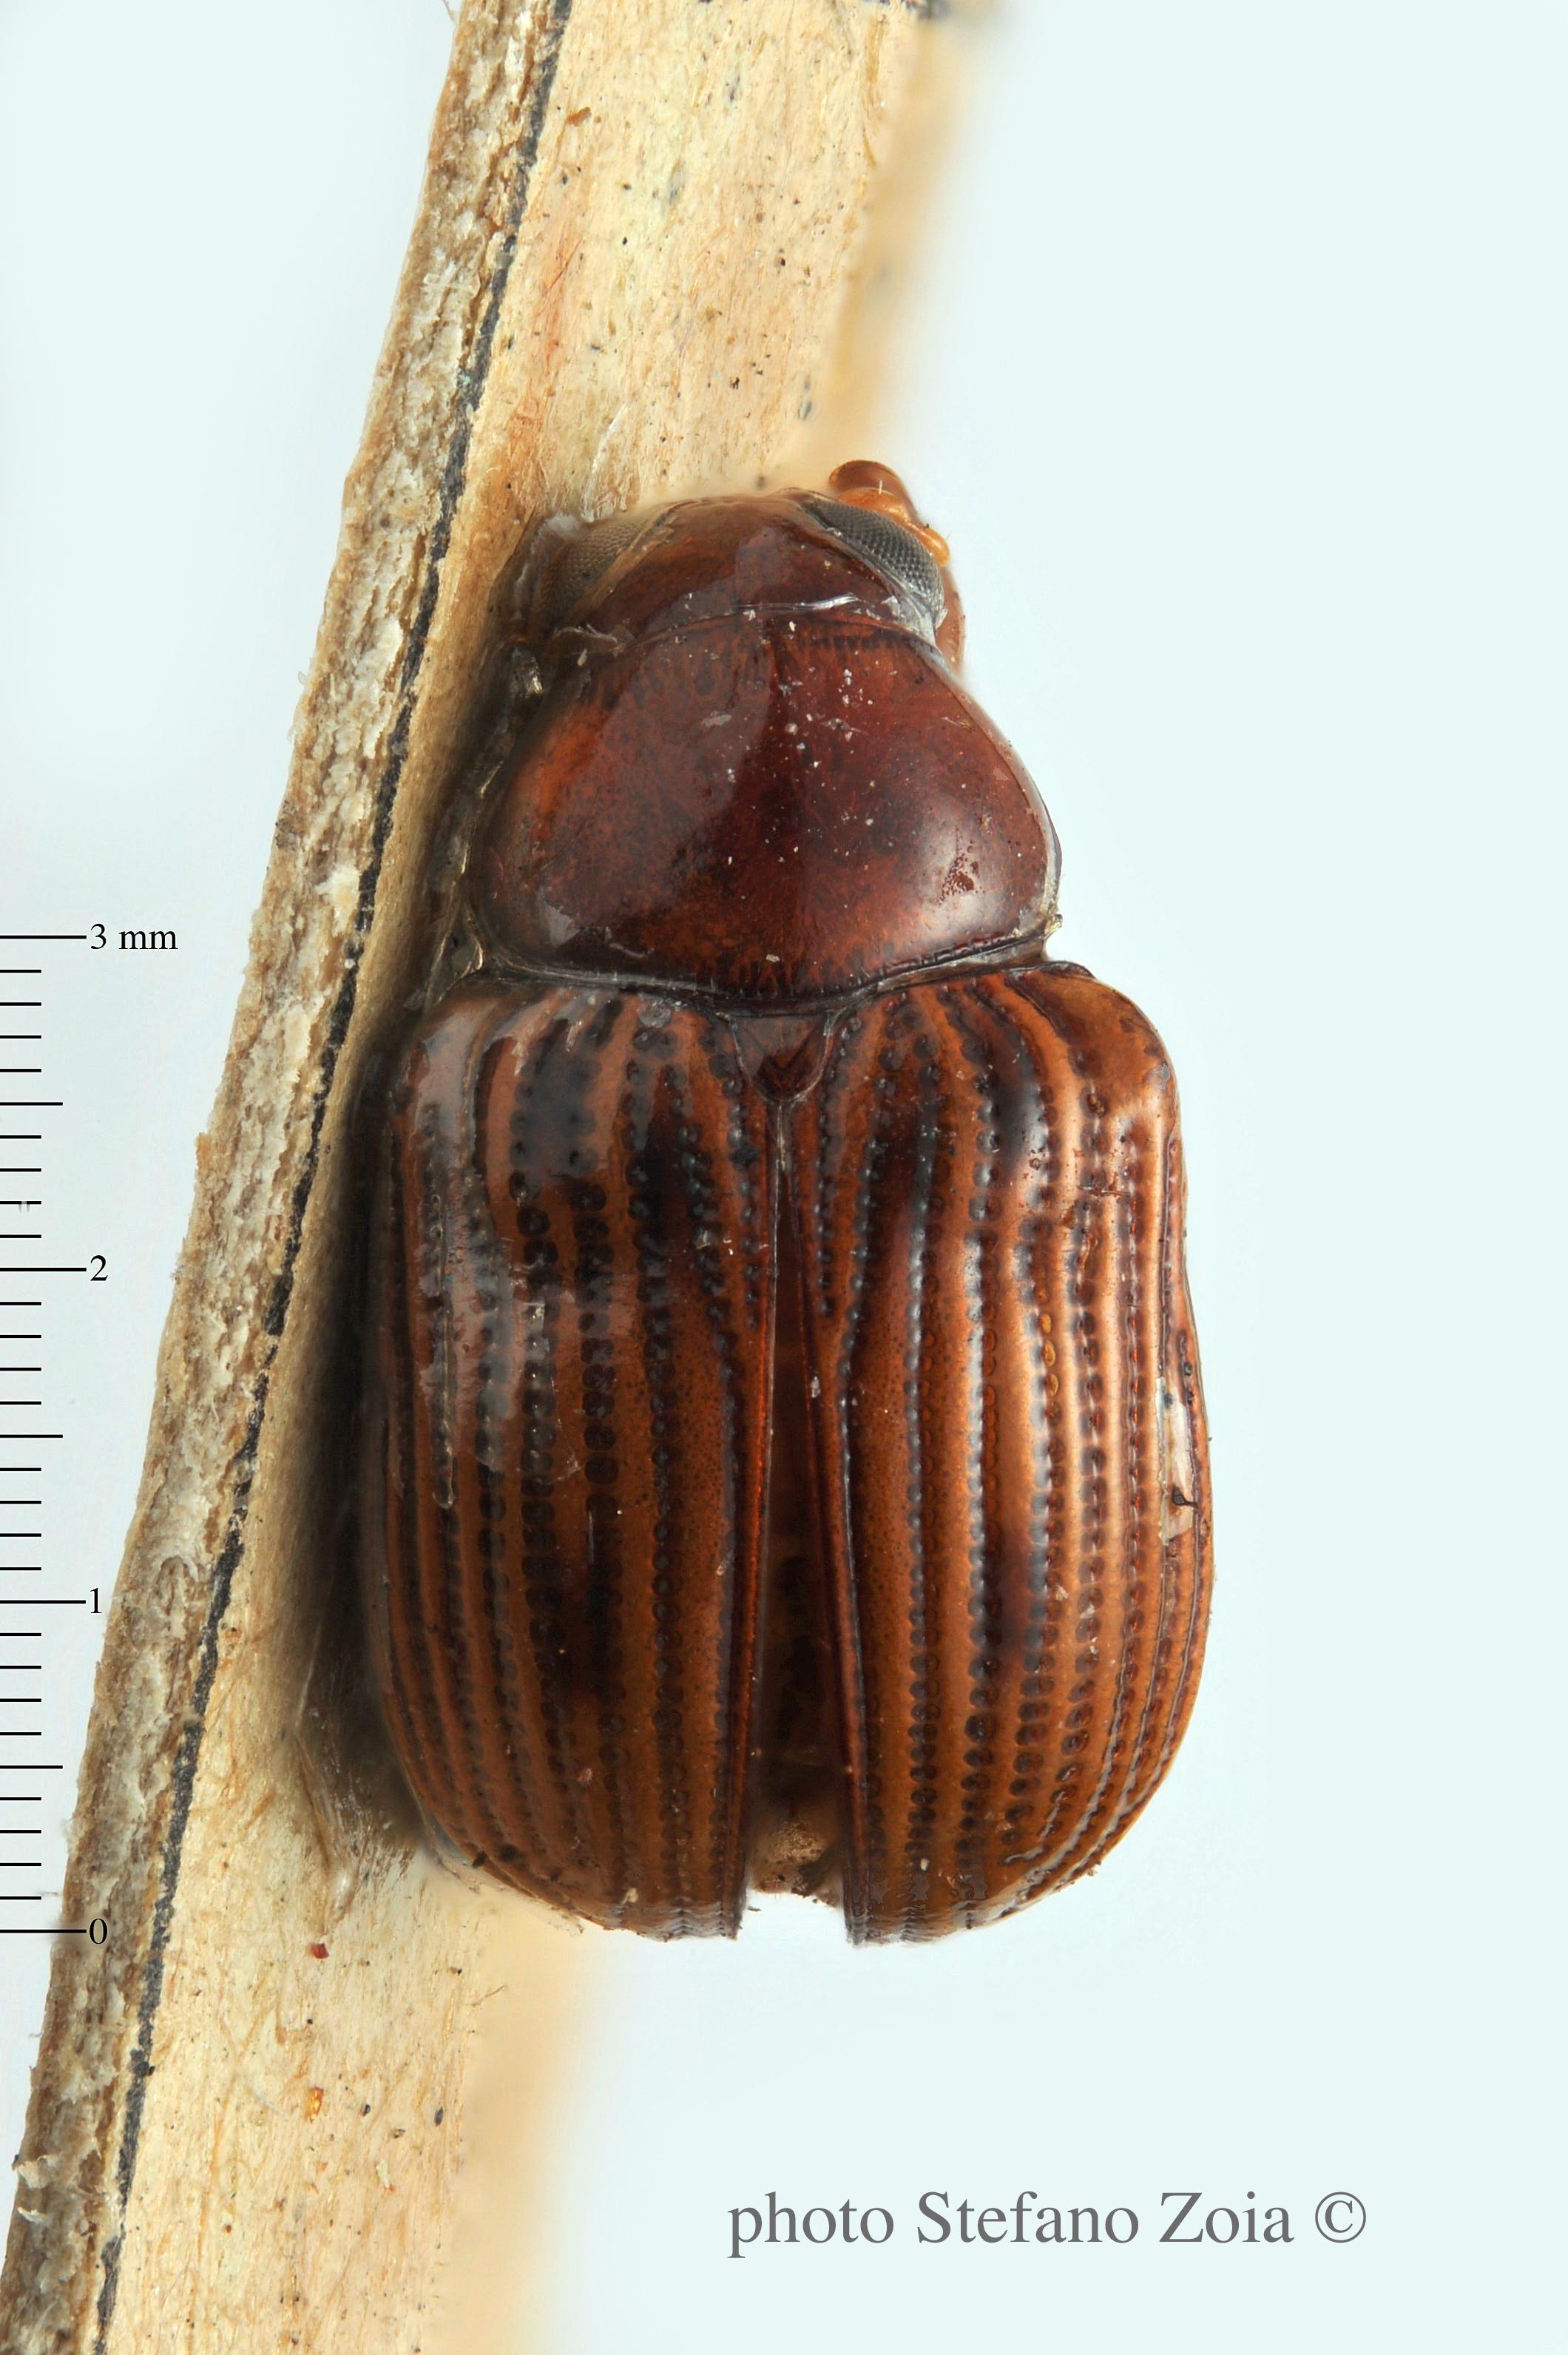 BE-RBINS-ENT Eurydemus brevilineatus 1 - 6431 - 6451.JPG